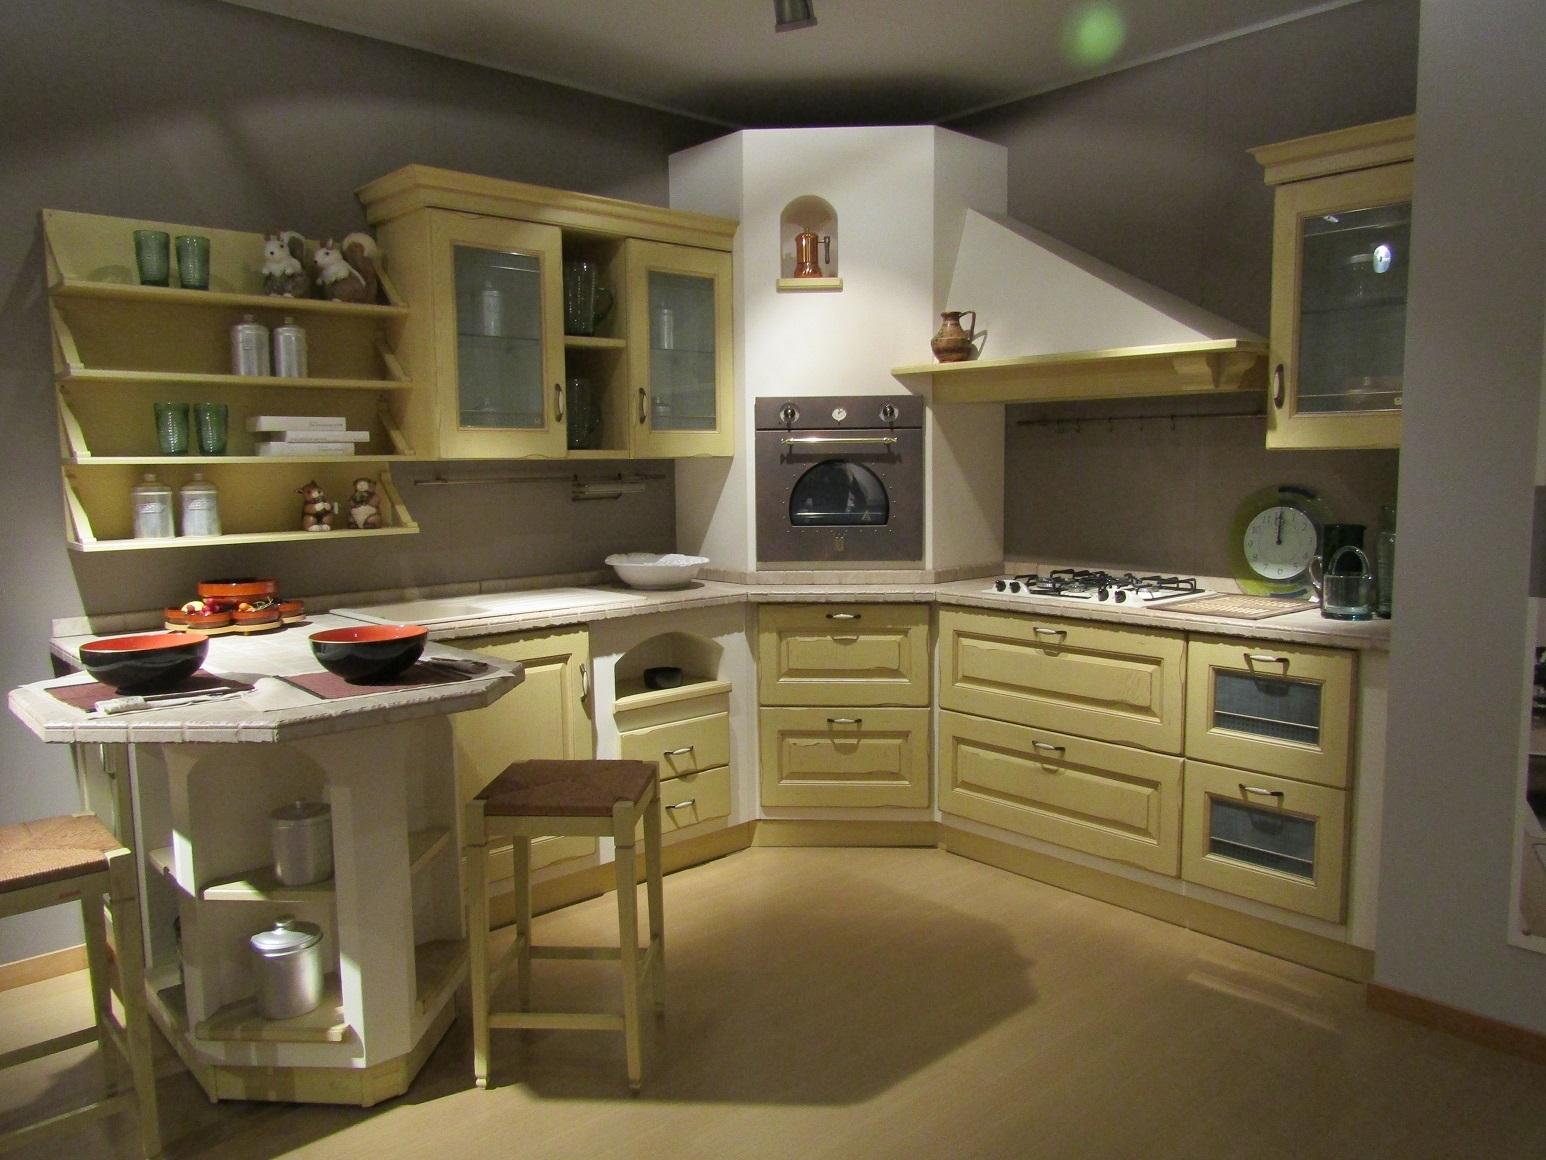 Awesome Configuratore Cucine Scavolini Photos - Design & Ideas ...